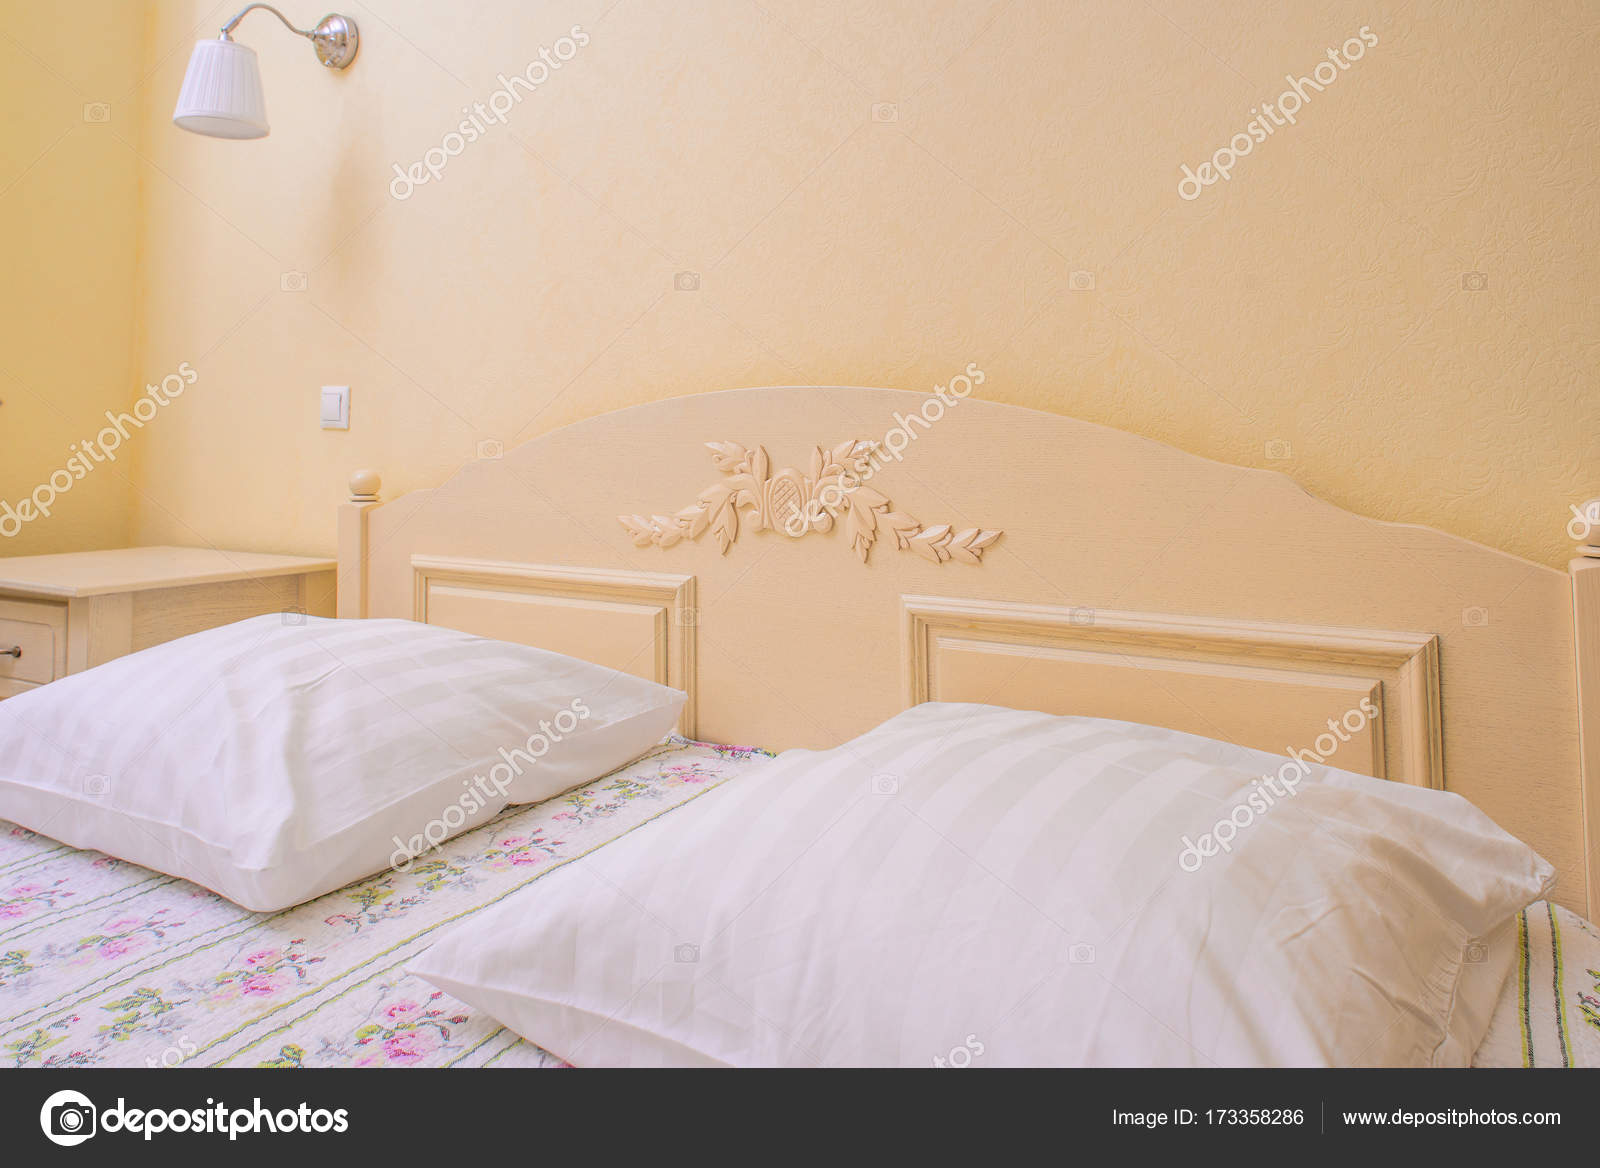 gele slaapkamer interieur — Stockfoto © ShmelevaNatalie #173358286